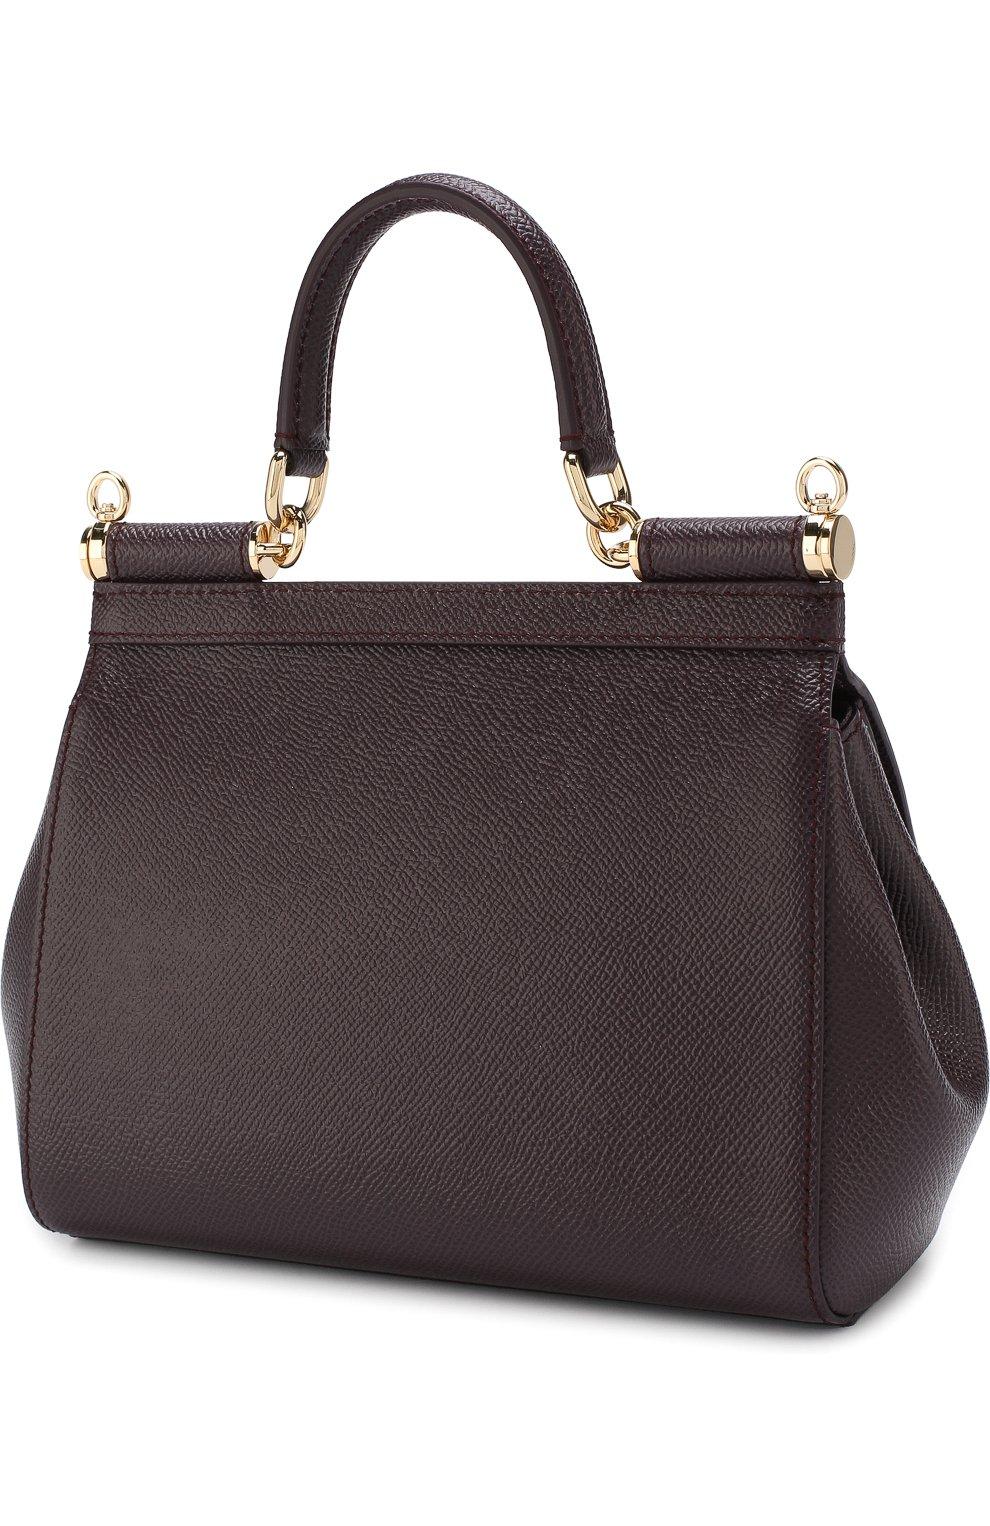 Женская сумка sicily small с аппликациями DOLCE & GABBANA бордового цвета, арт. BB6003/B5230 | Фото 3